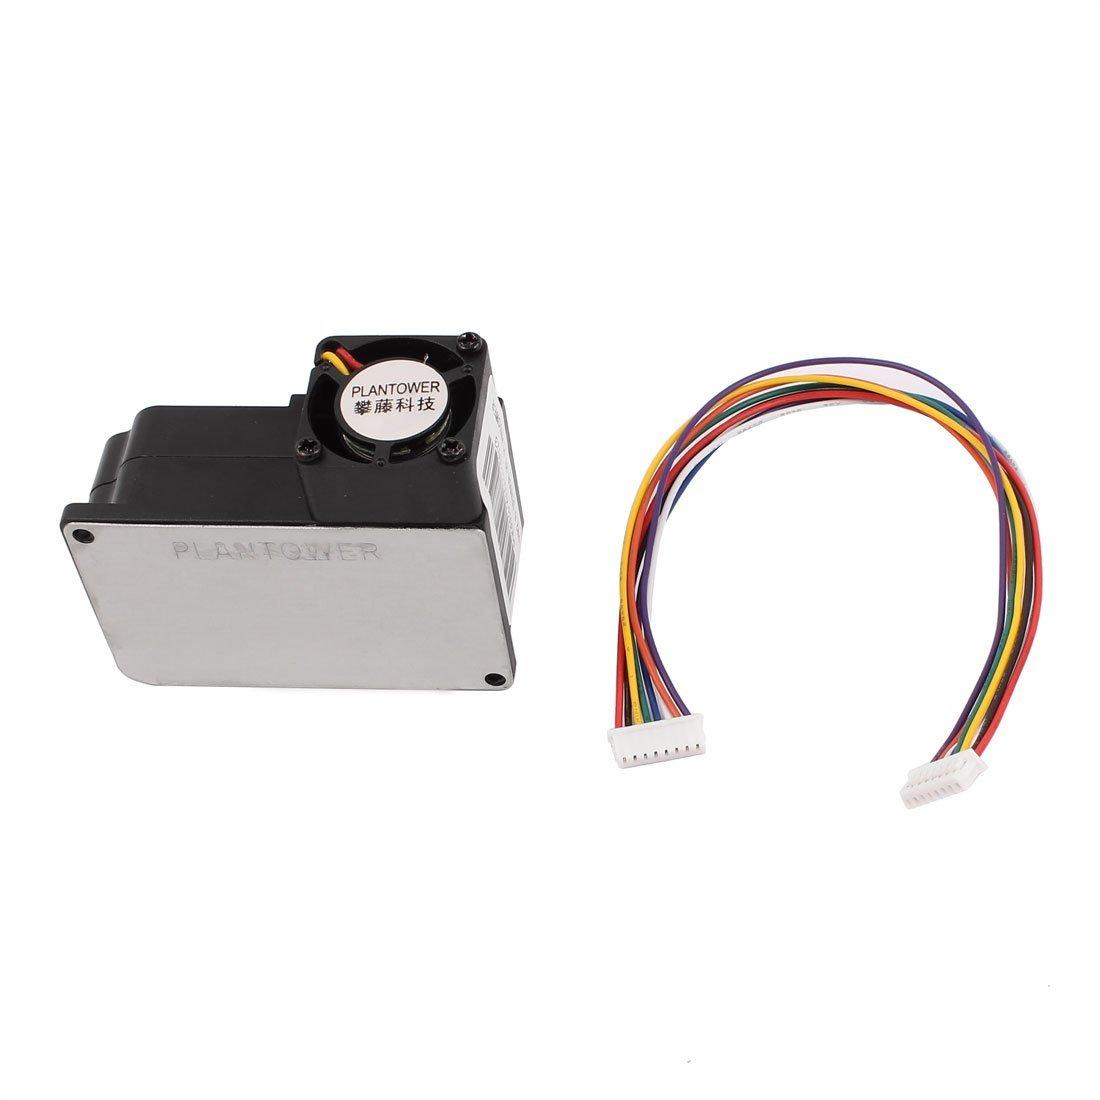 Módulo Sensor láser eDealMax Polvo El polvo Detector de aire purificador de PM1.0 PM2.5 DE PM10